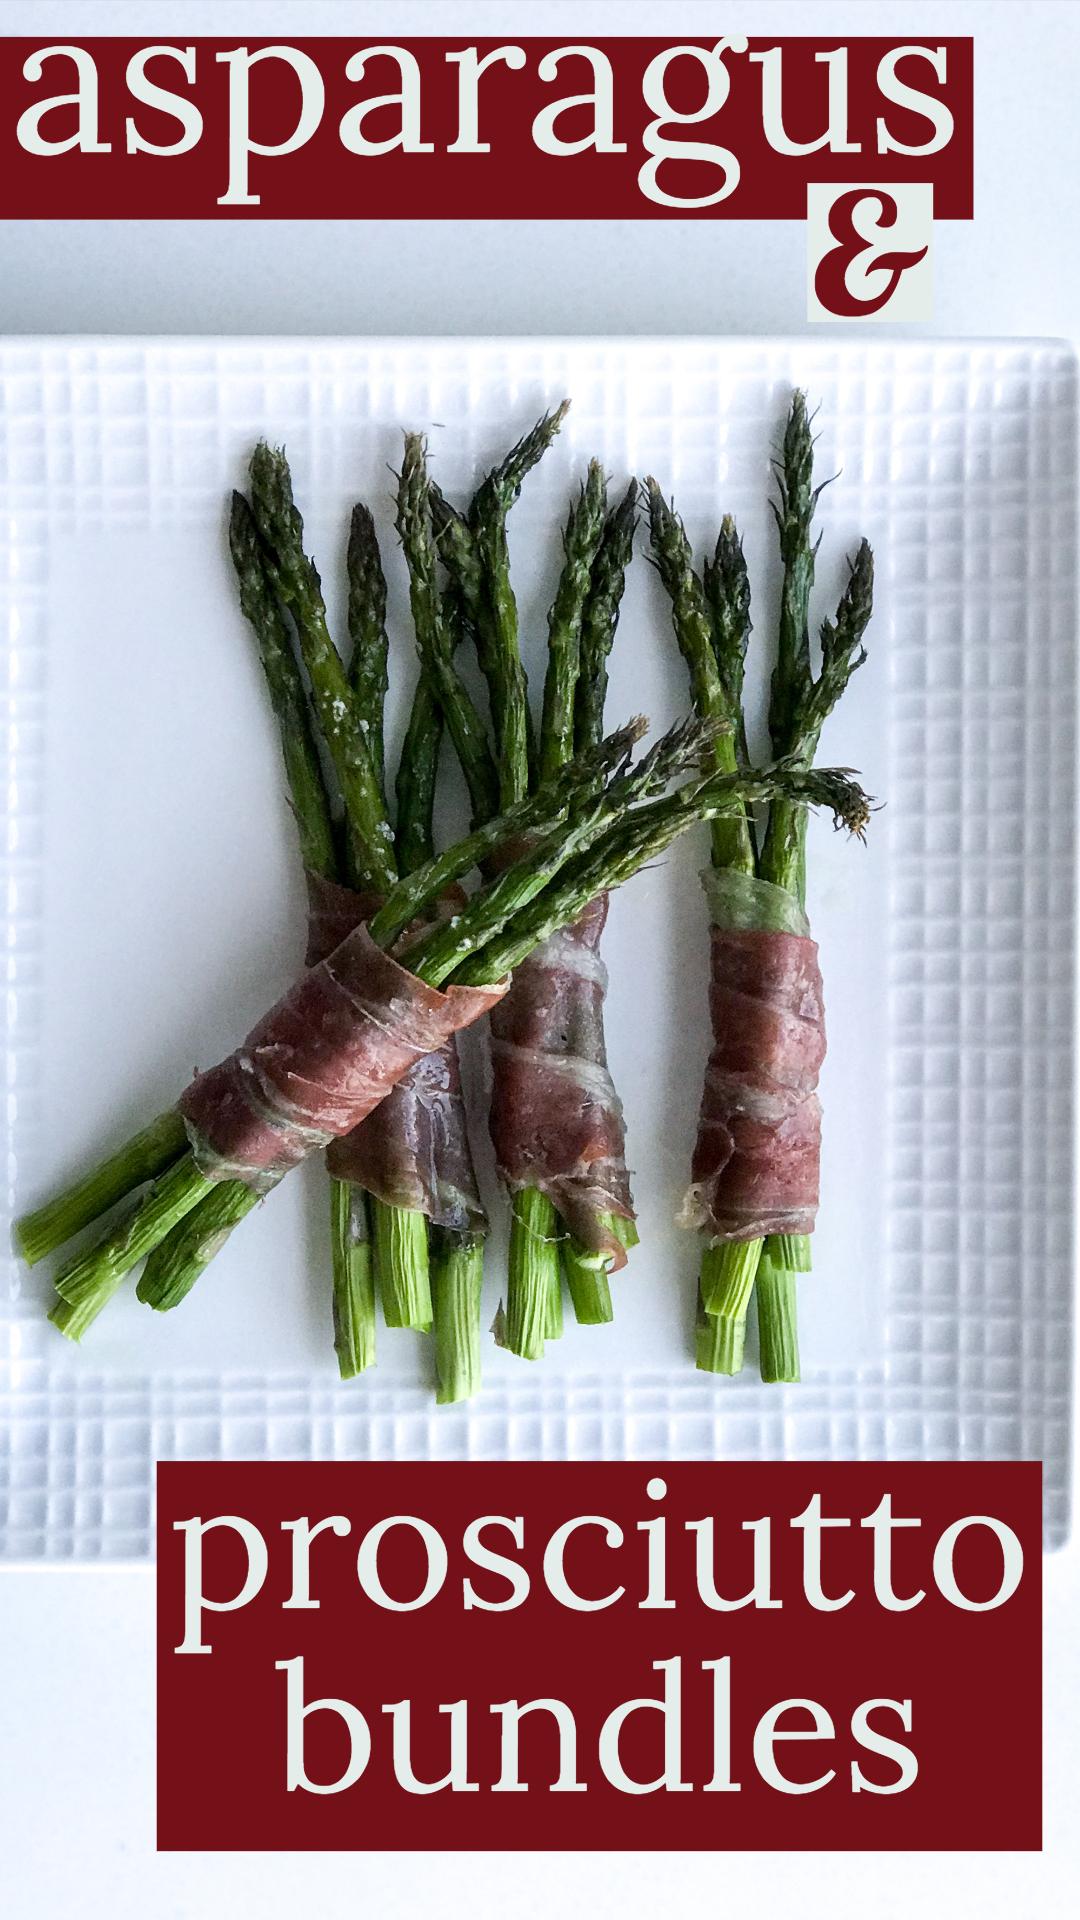 Asparagus & Prosciutto Bundles